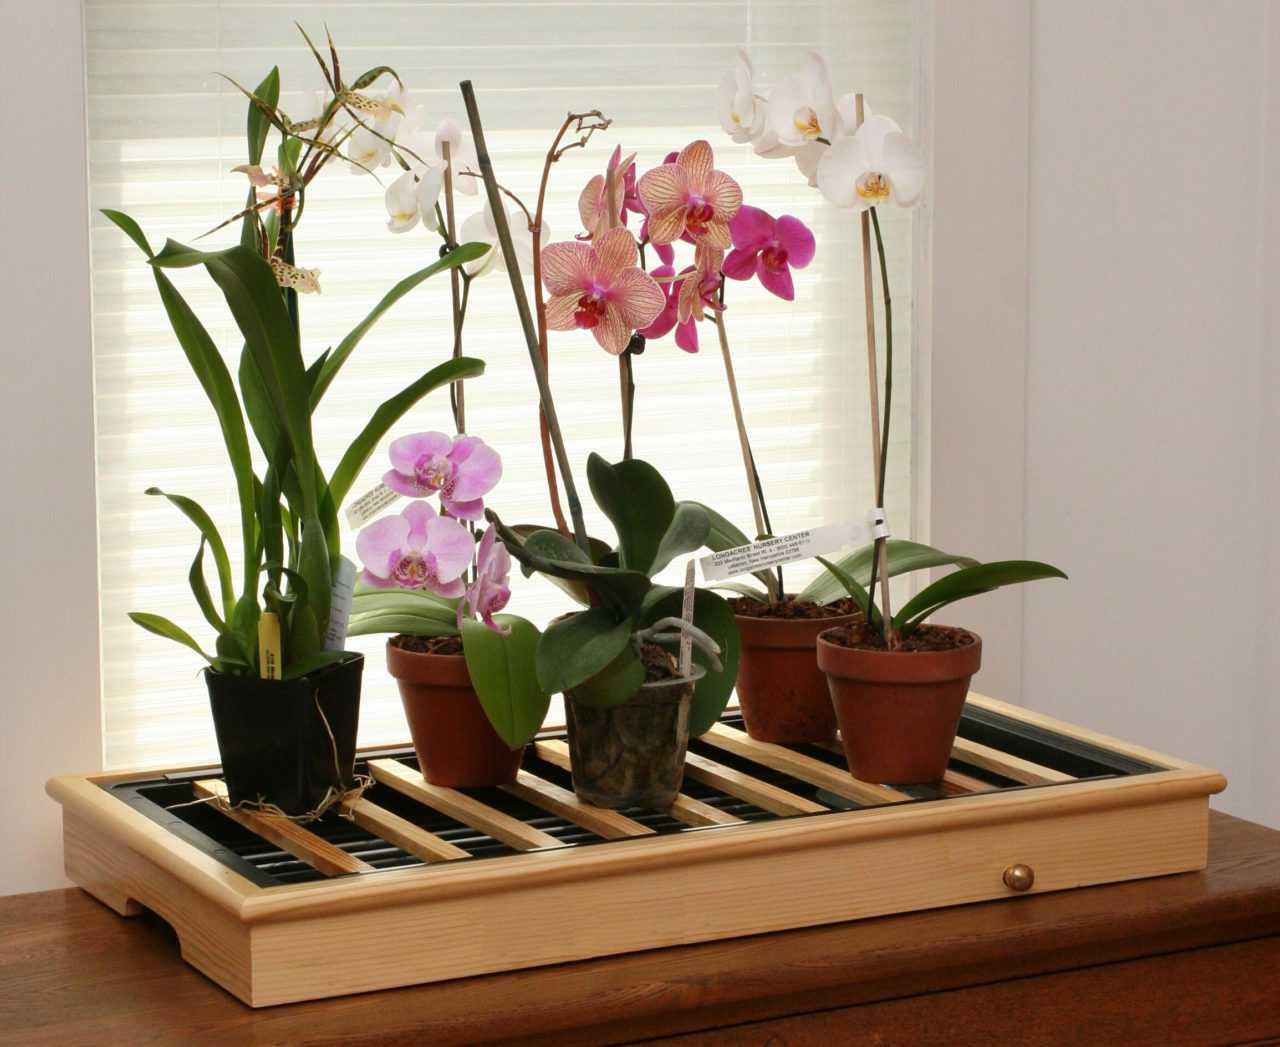 orhideya-falenopsis-foto-video-vidyi-falenopsis-harakteristika-i-opisanie-16